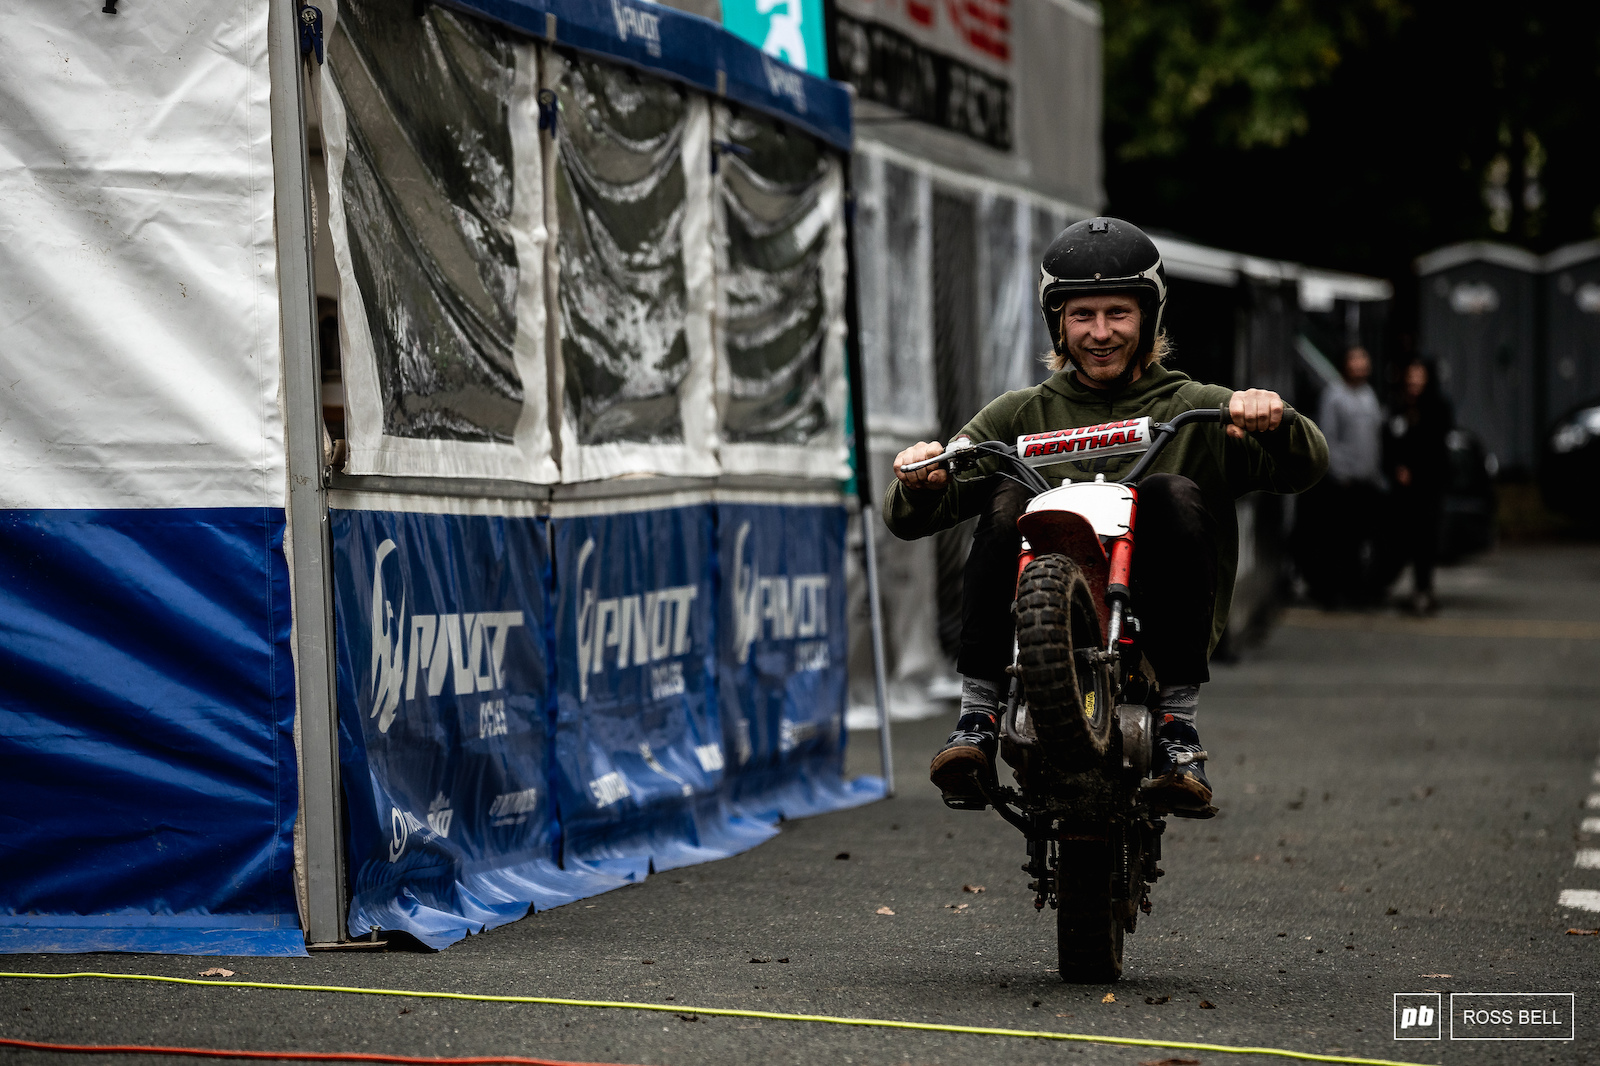 Bernard Kerr gets his daily quota of wheelies in.